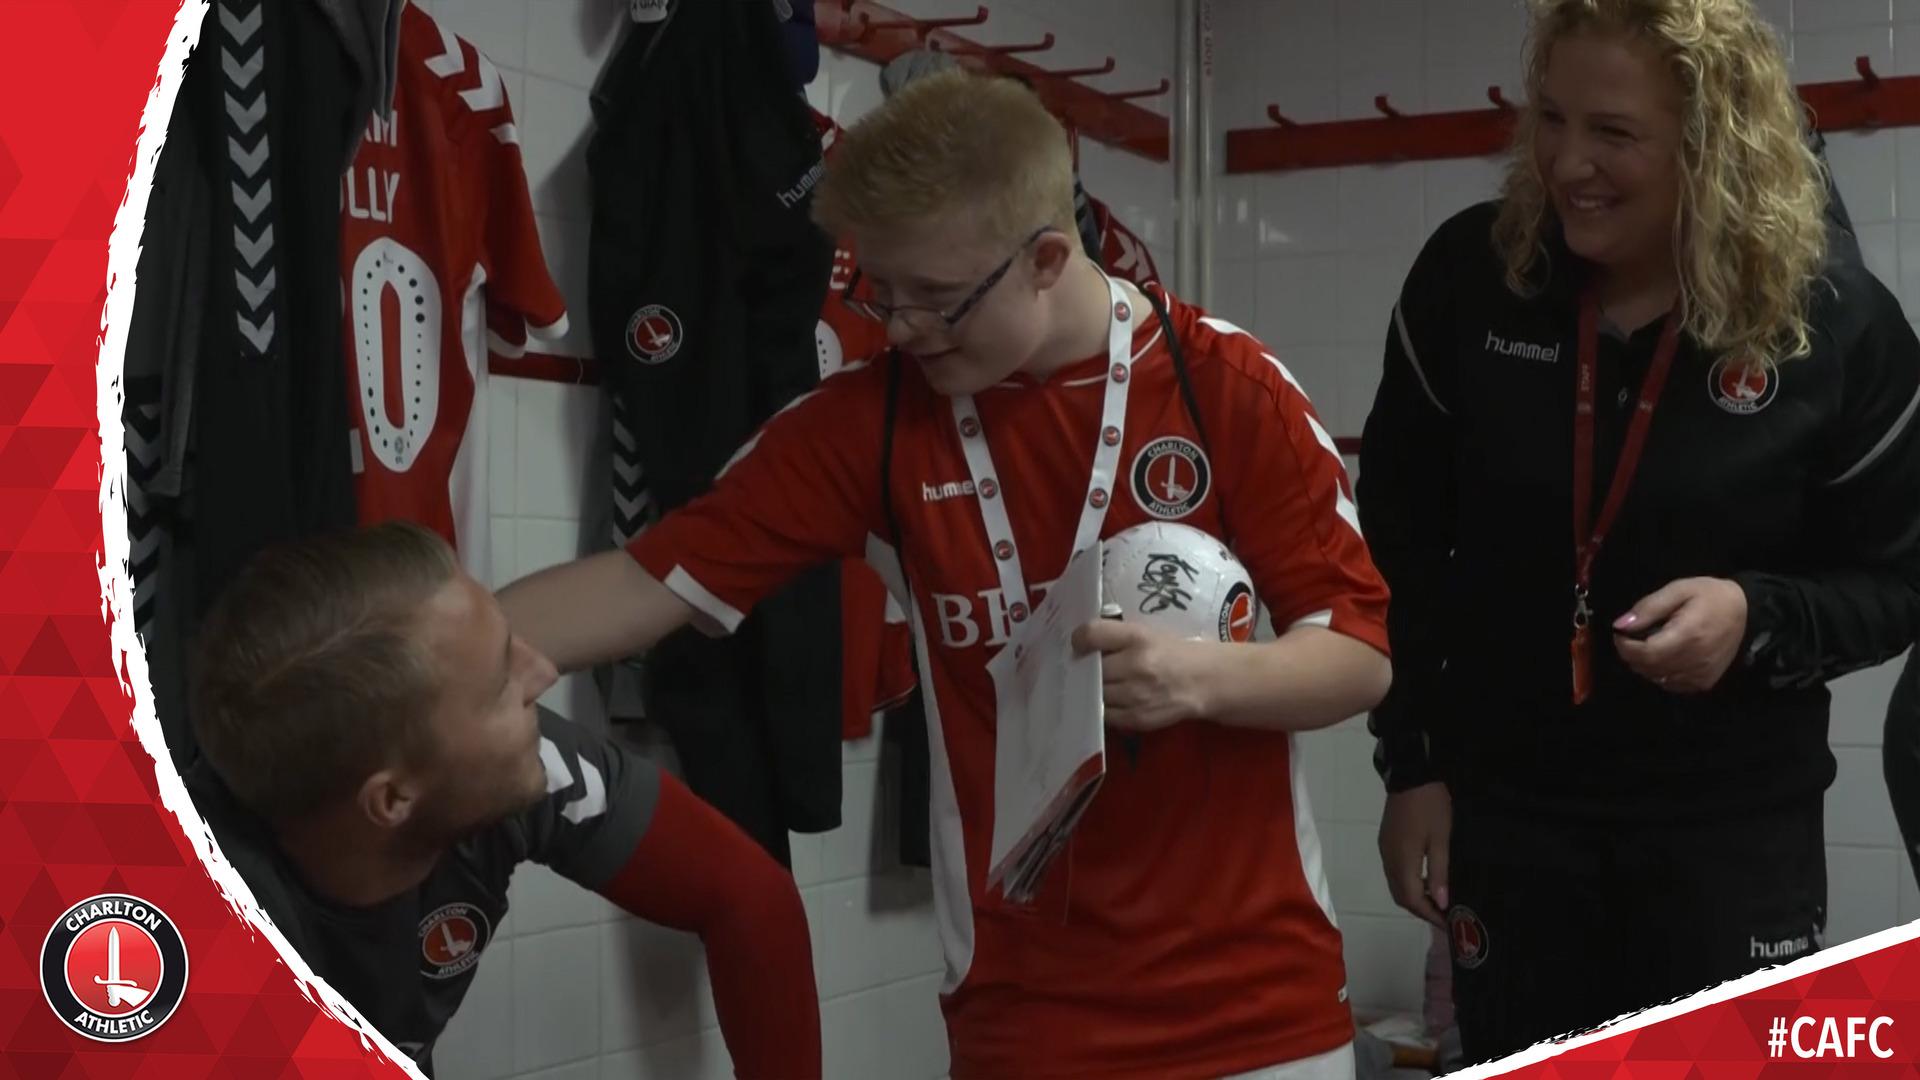 Charlton fan James' day as a matchday mascot